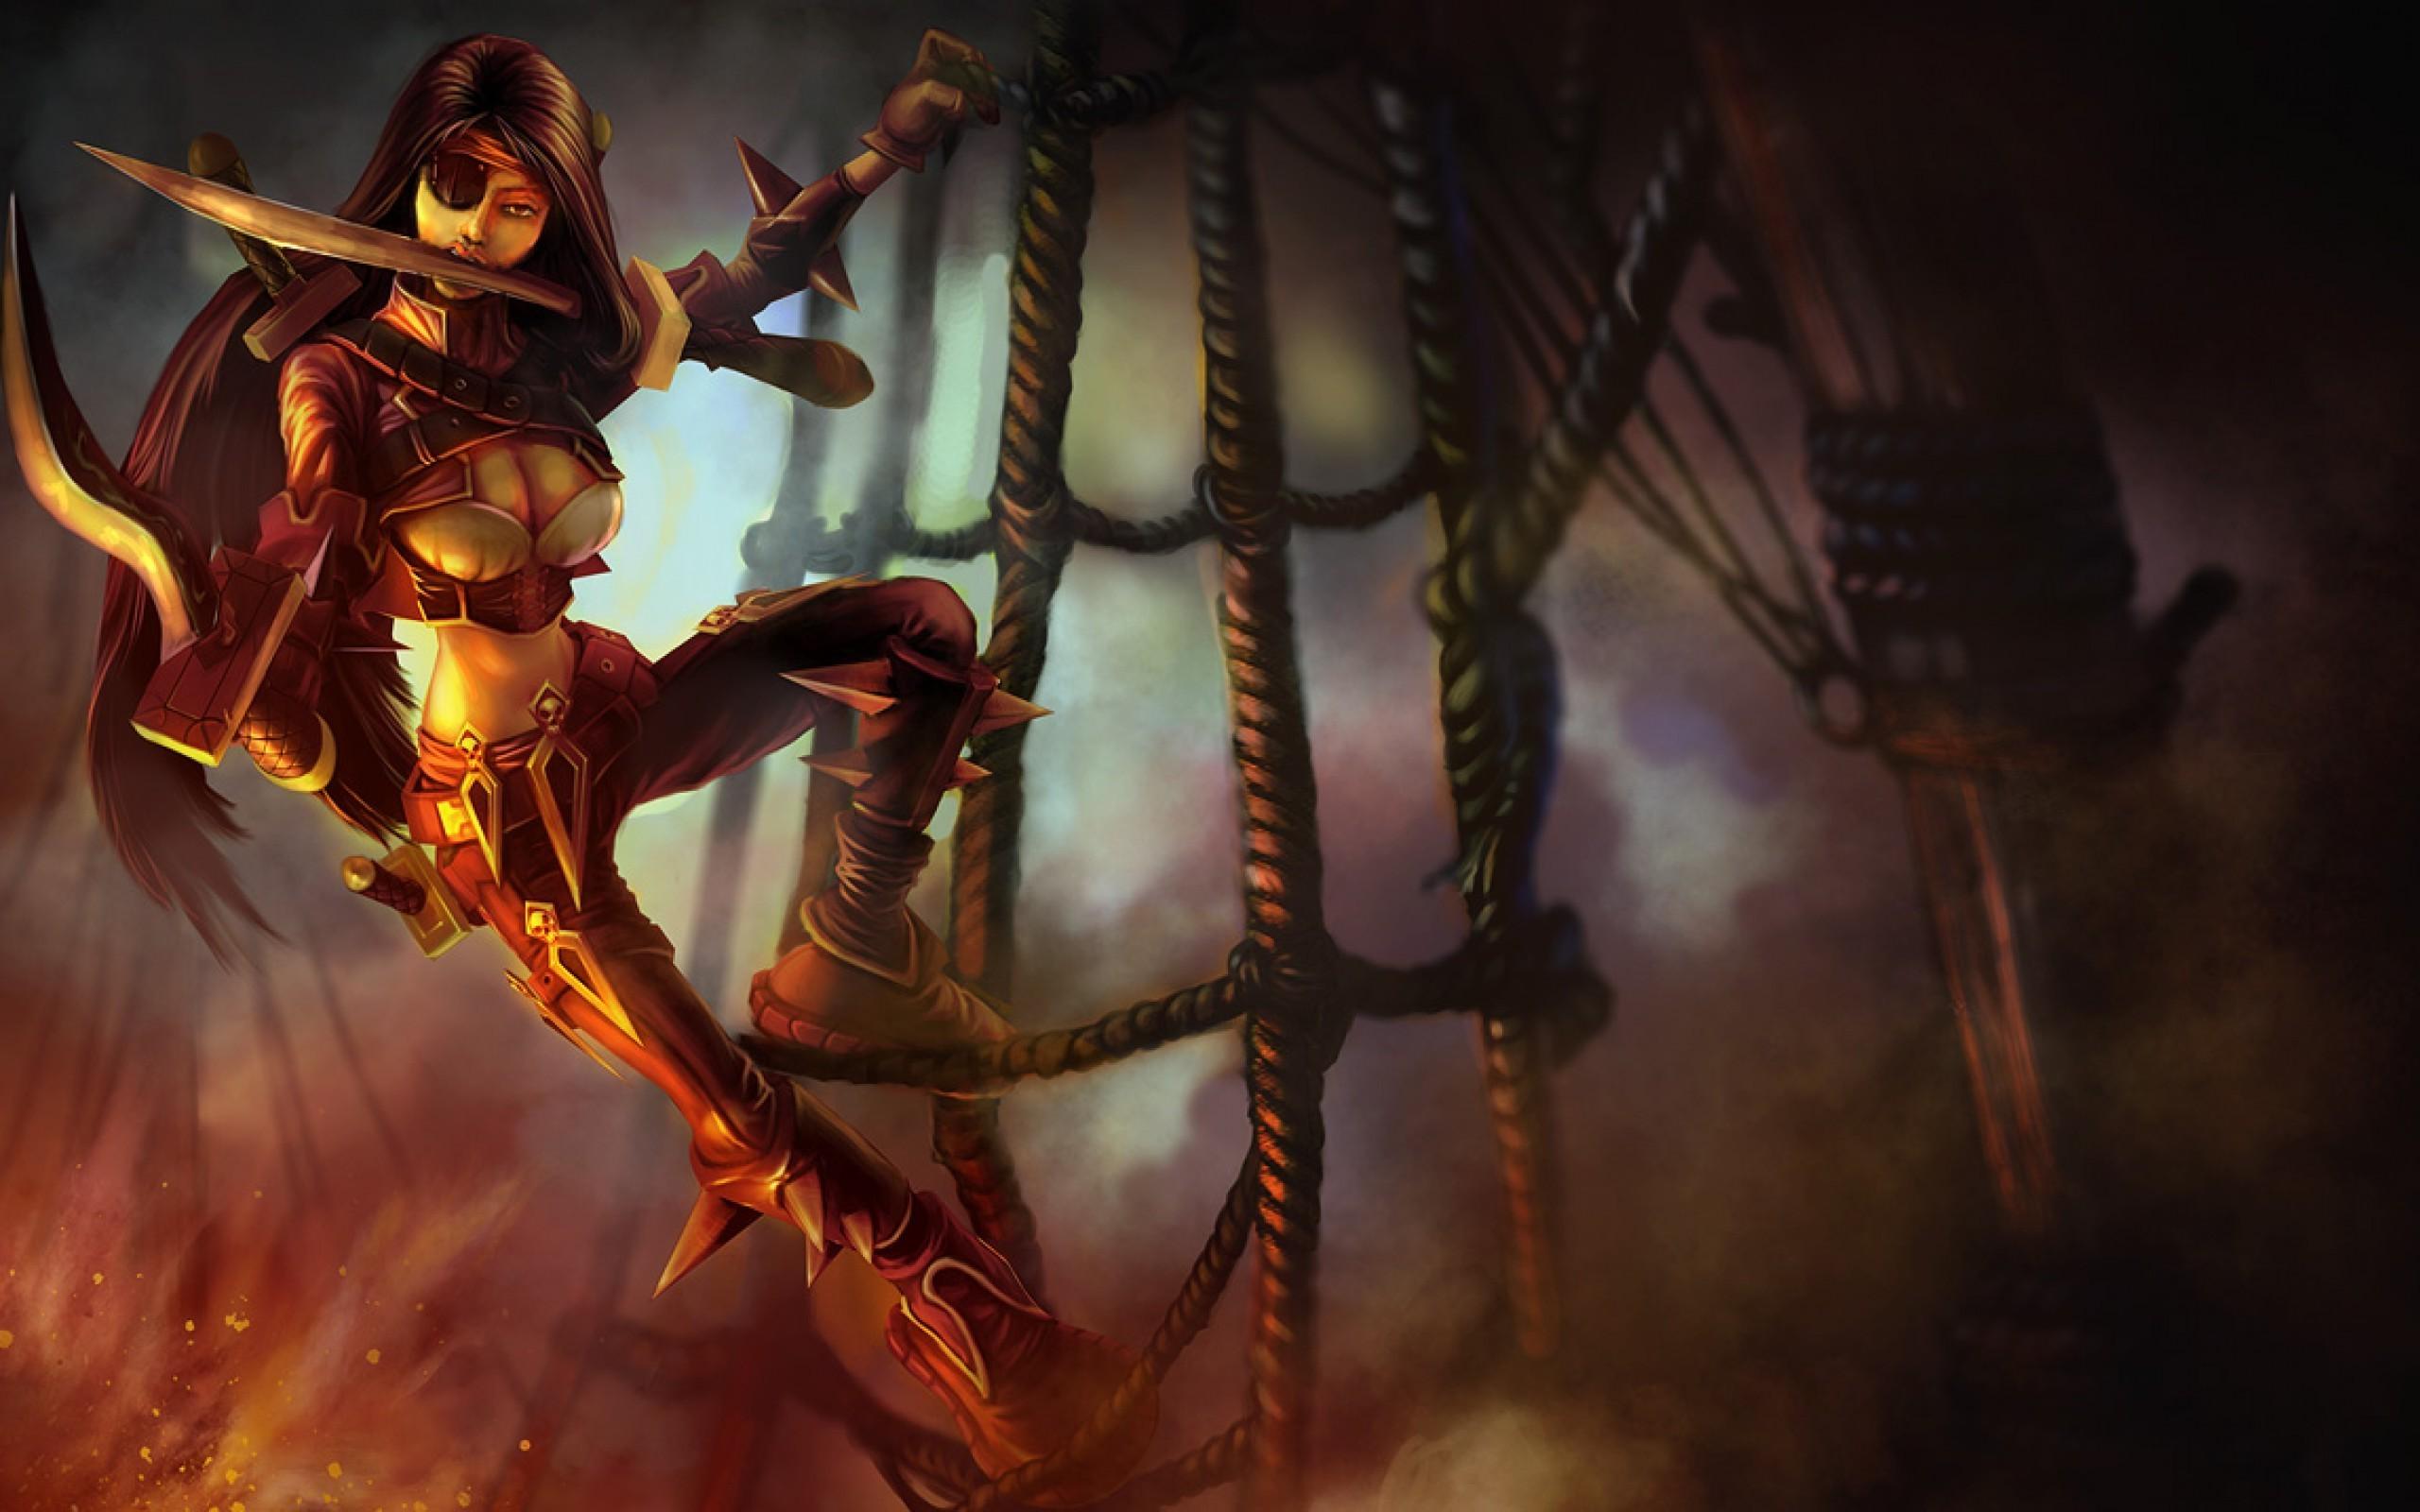 Katarina, League Of Legends Wallpapers Hd / Desktop - Katarina League Of Legends Wallpaper Art , HD Wallpaper & Backgrounds